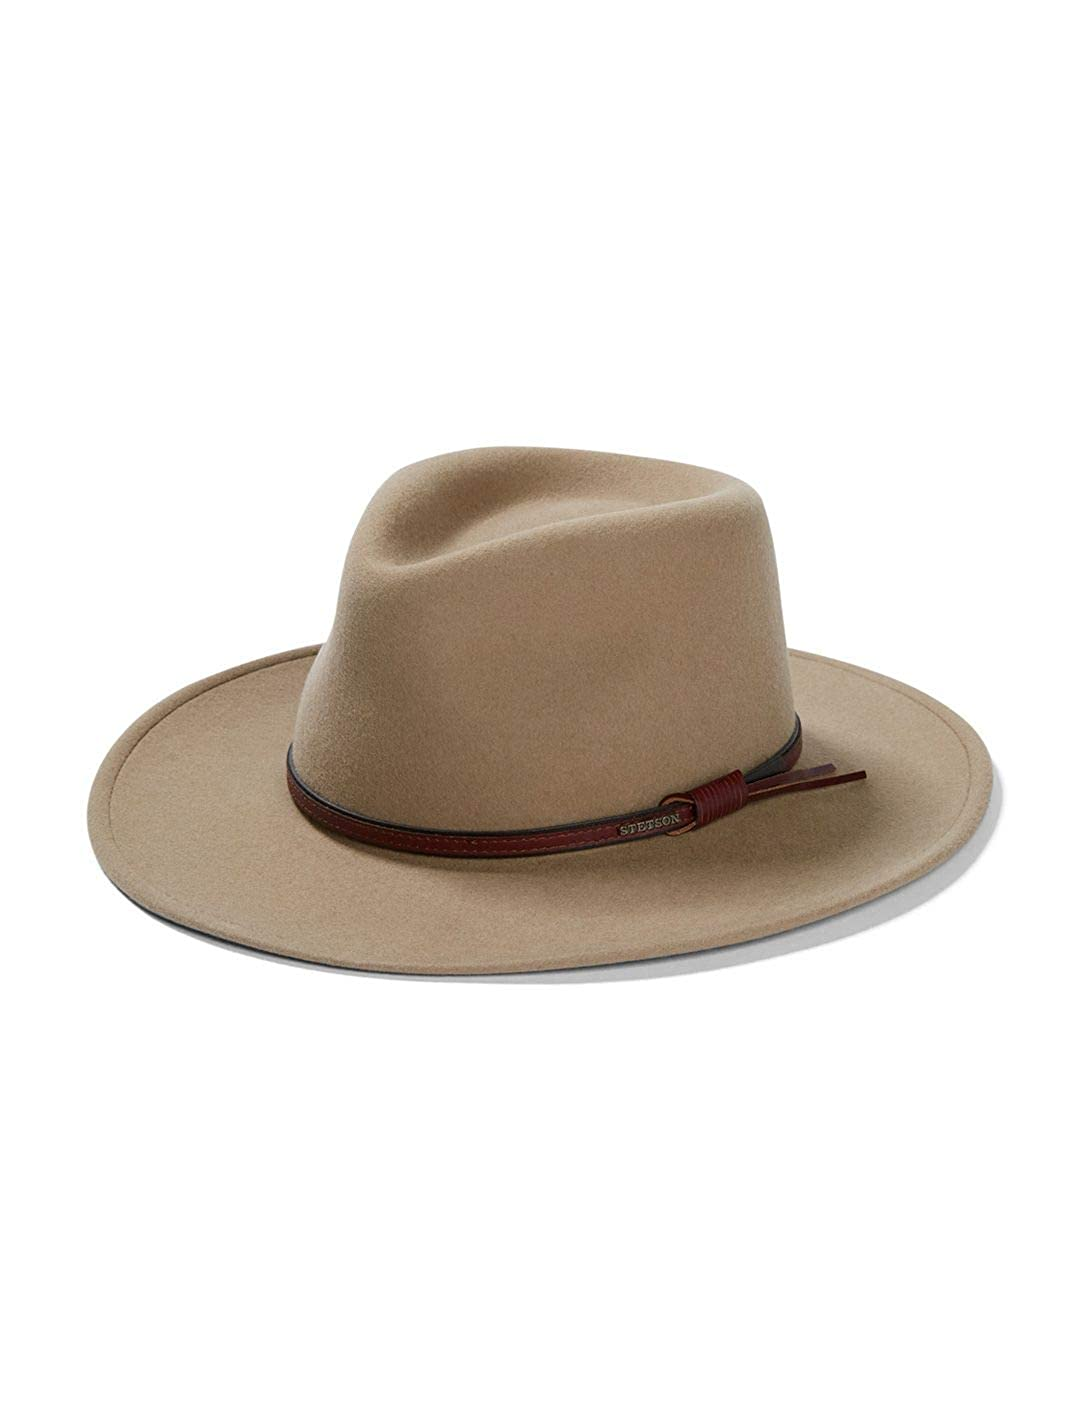 Mushroom Stetson Bozeman Crushable Outdoor Wool Felt Hat